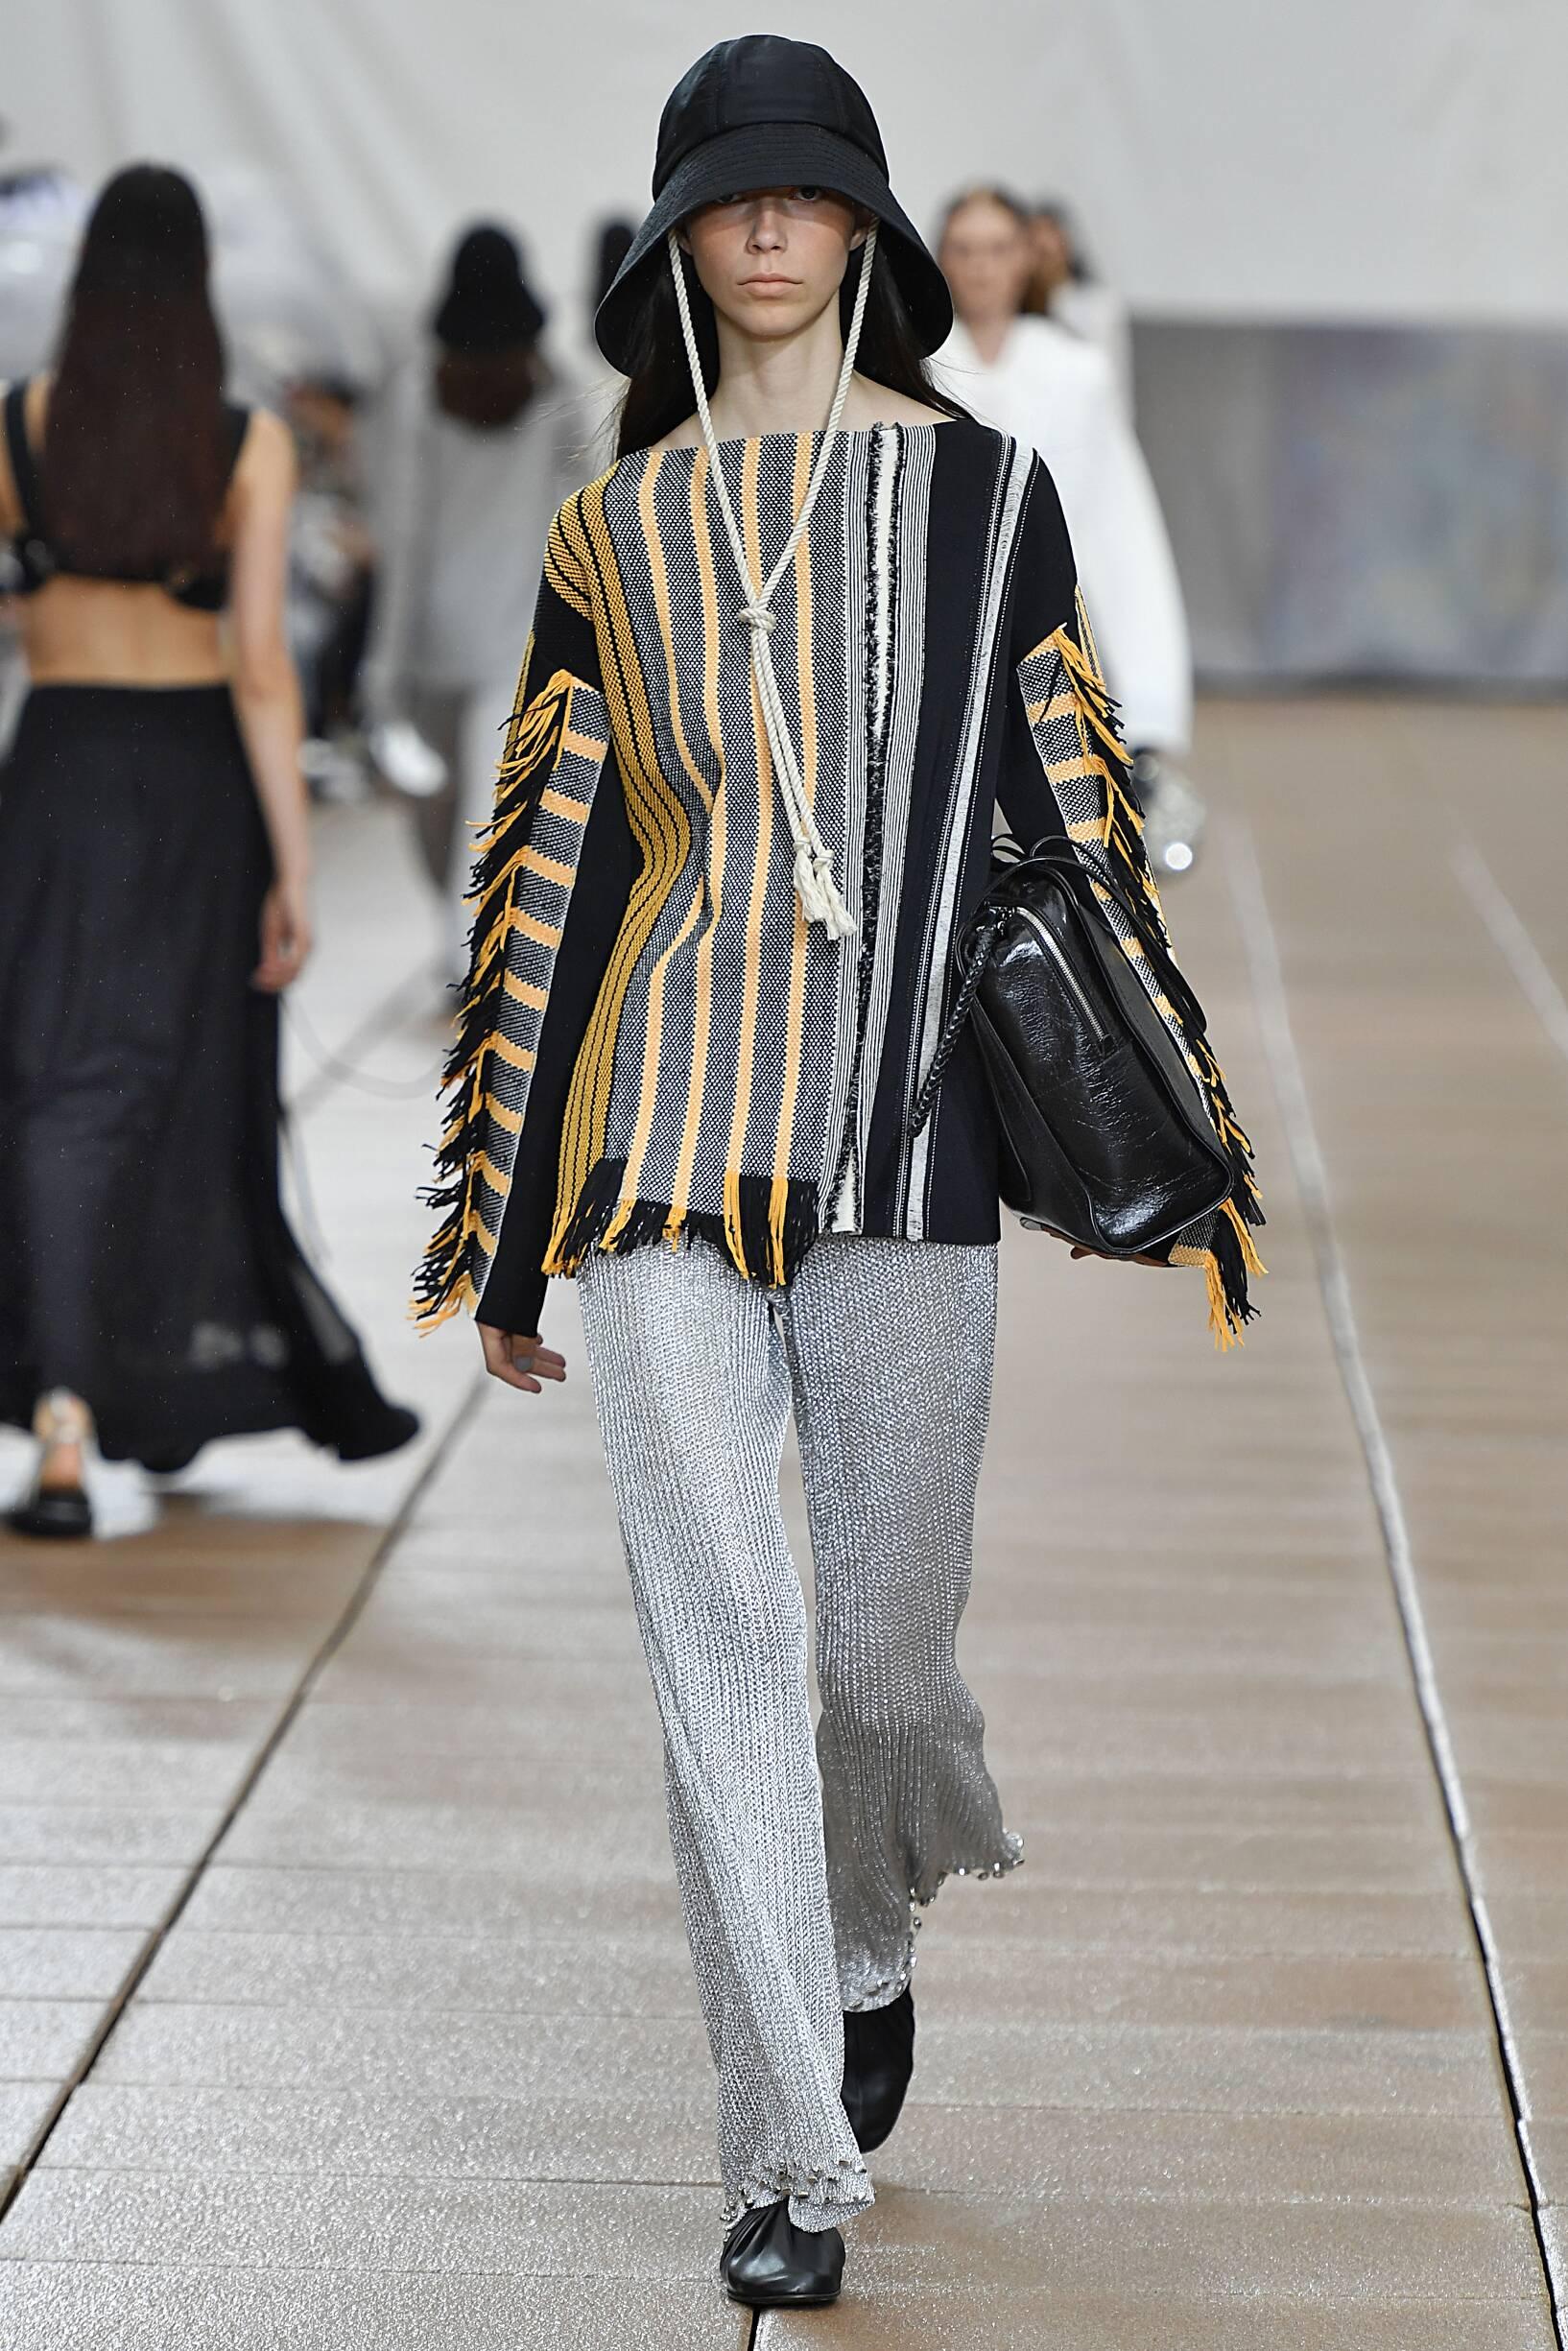 Fashion Woman Model 3.1 Phillip Lim Catwalk